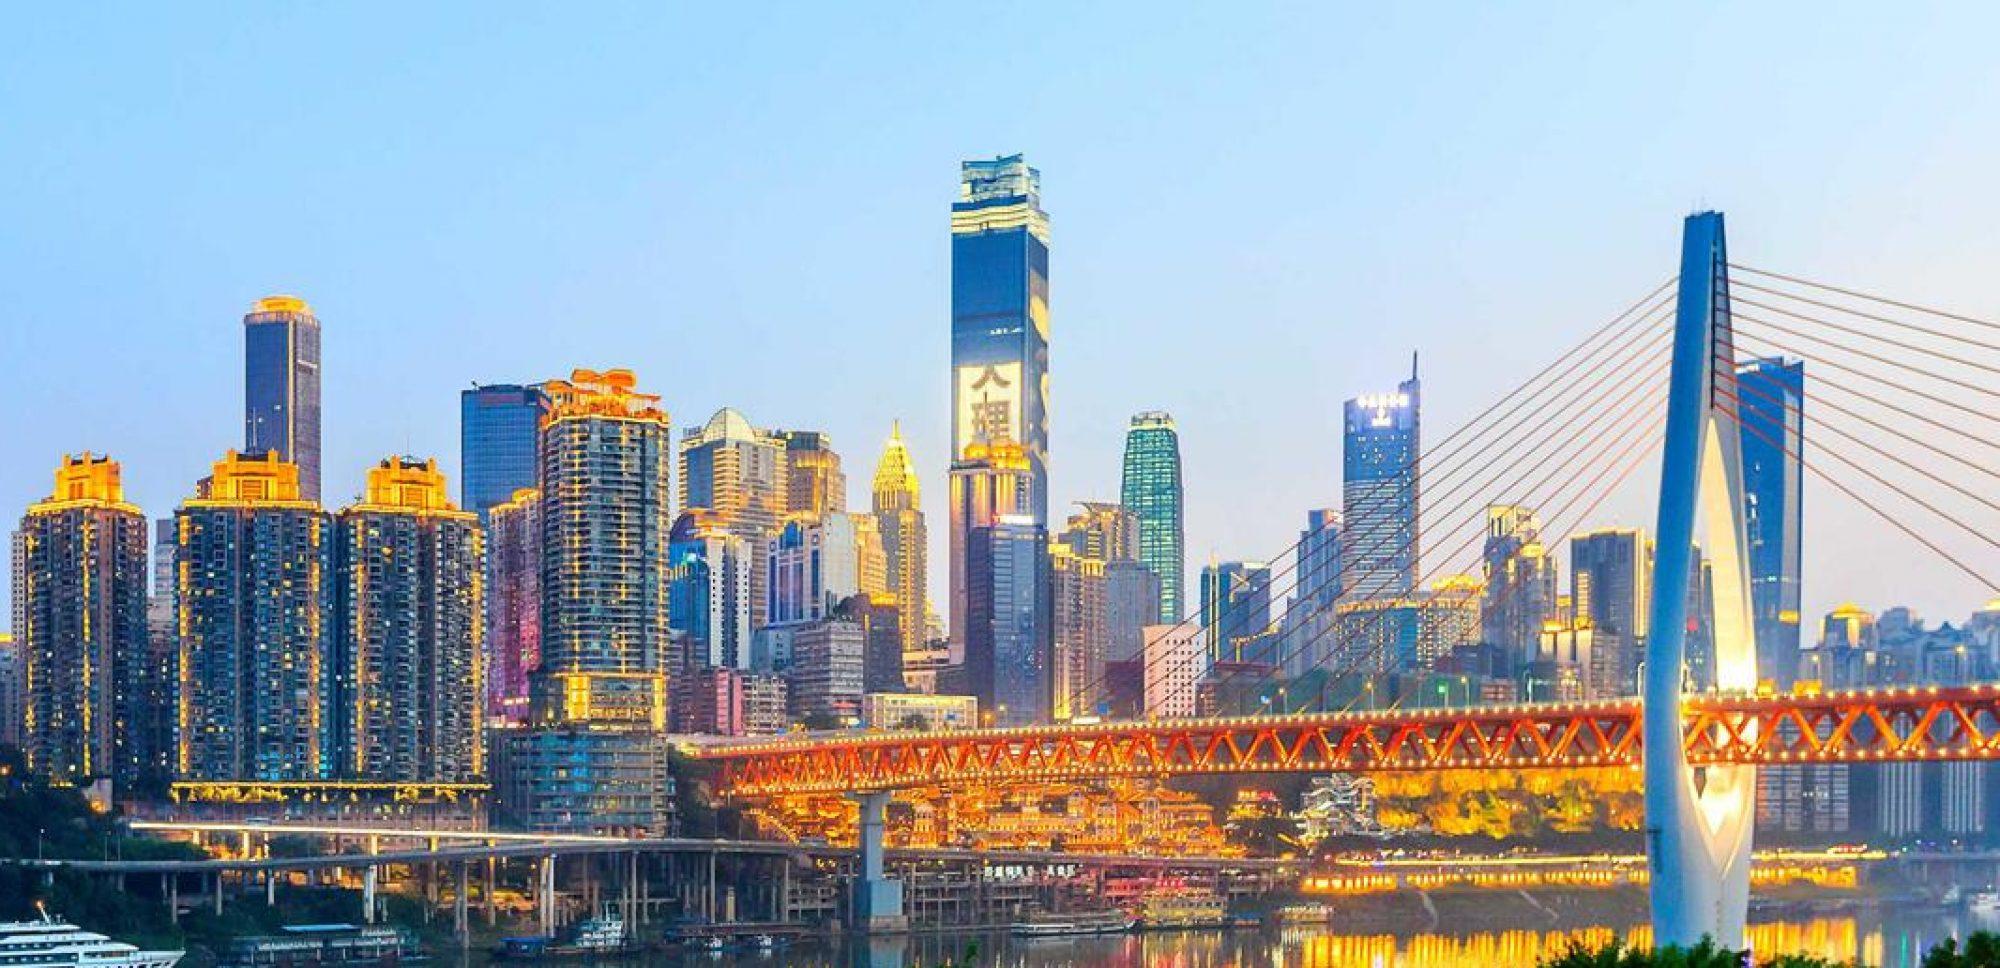 Cina al Centro Chongqing